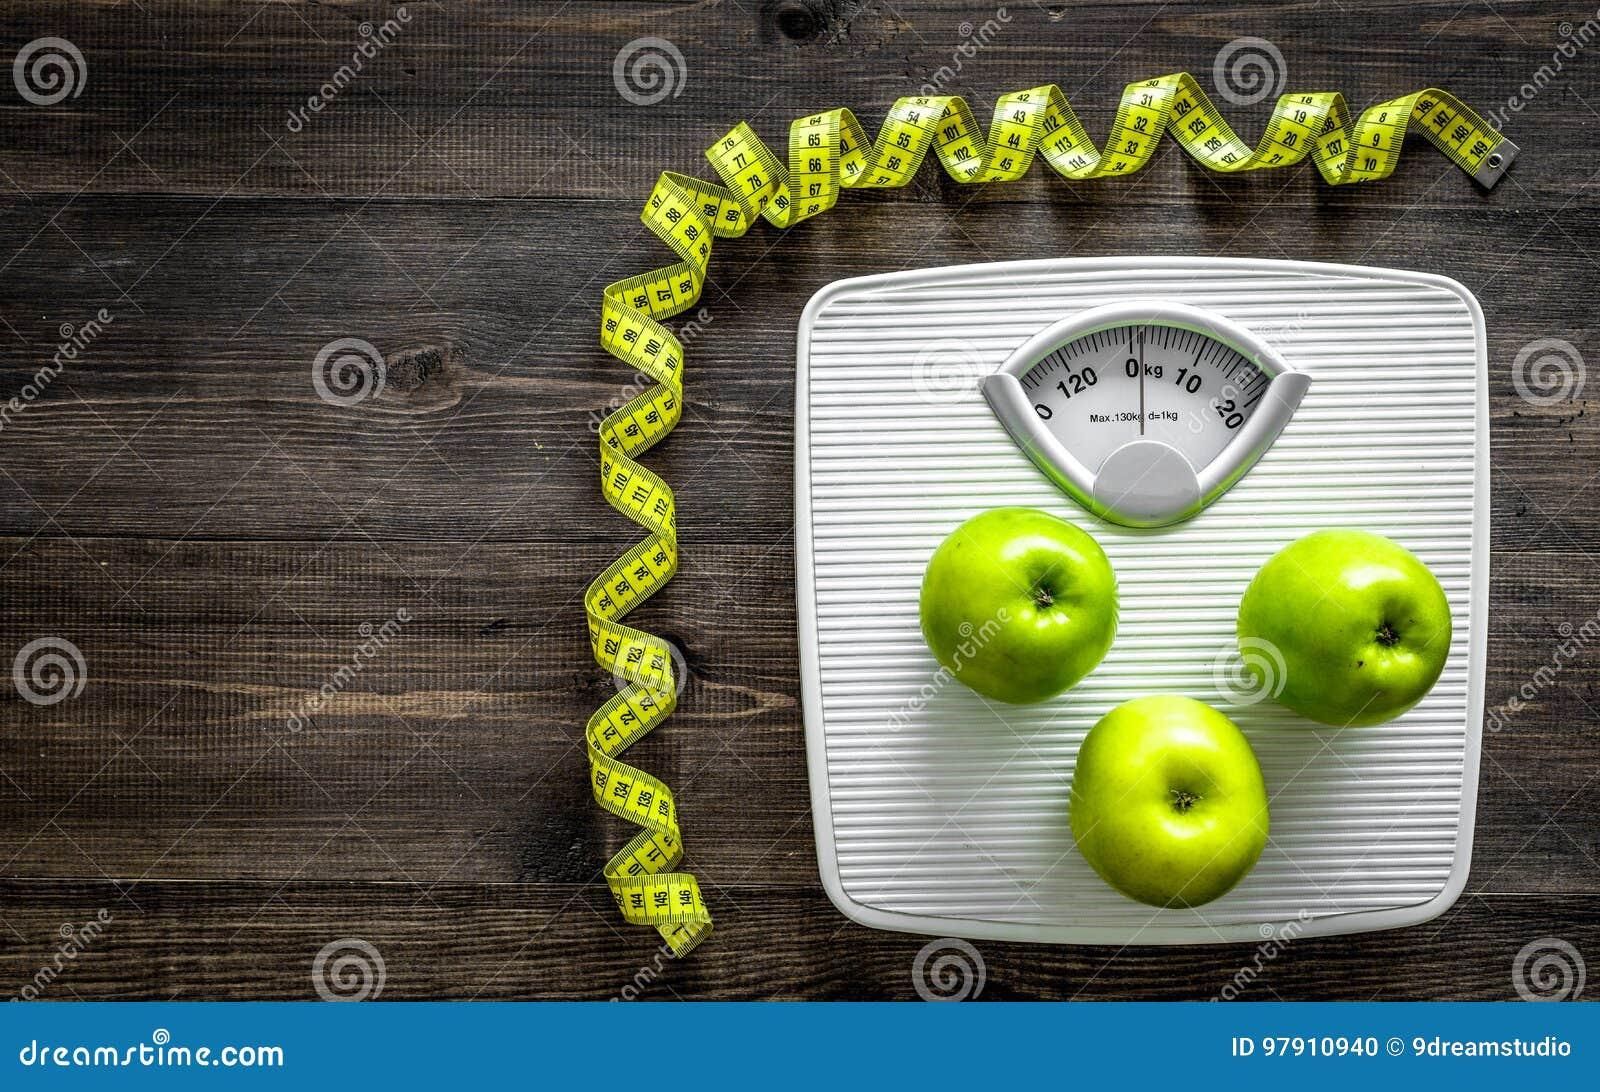 8 week diet plan for diabetics photo 6